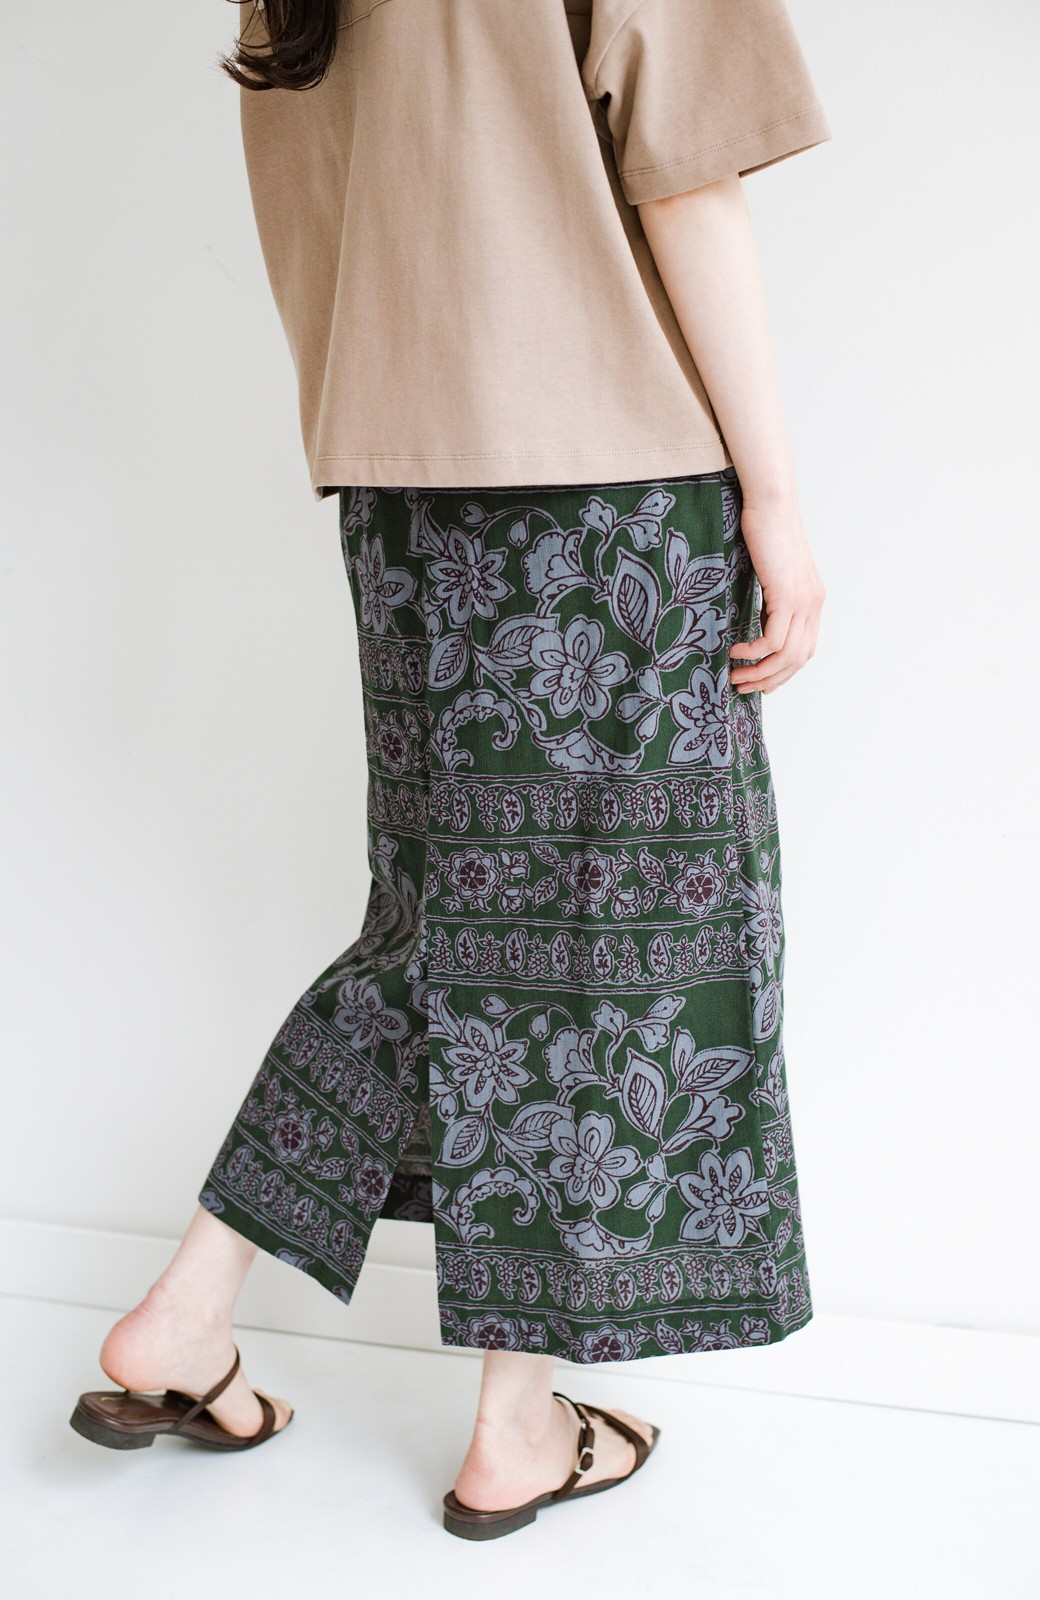 haco! 京都の浴衣屋さんと作った浴衣生地のセミタイトスカート <グリーン系その他>の商品写真8